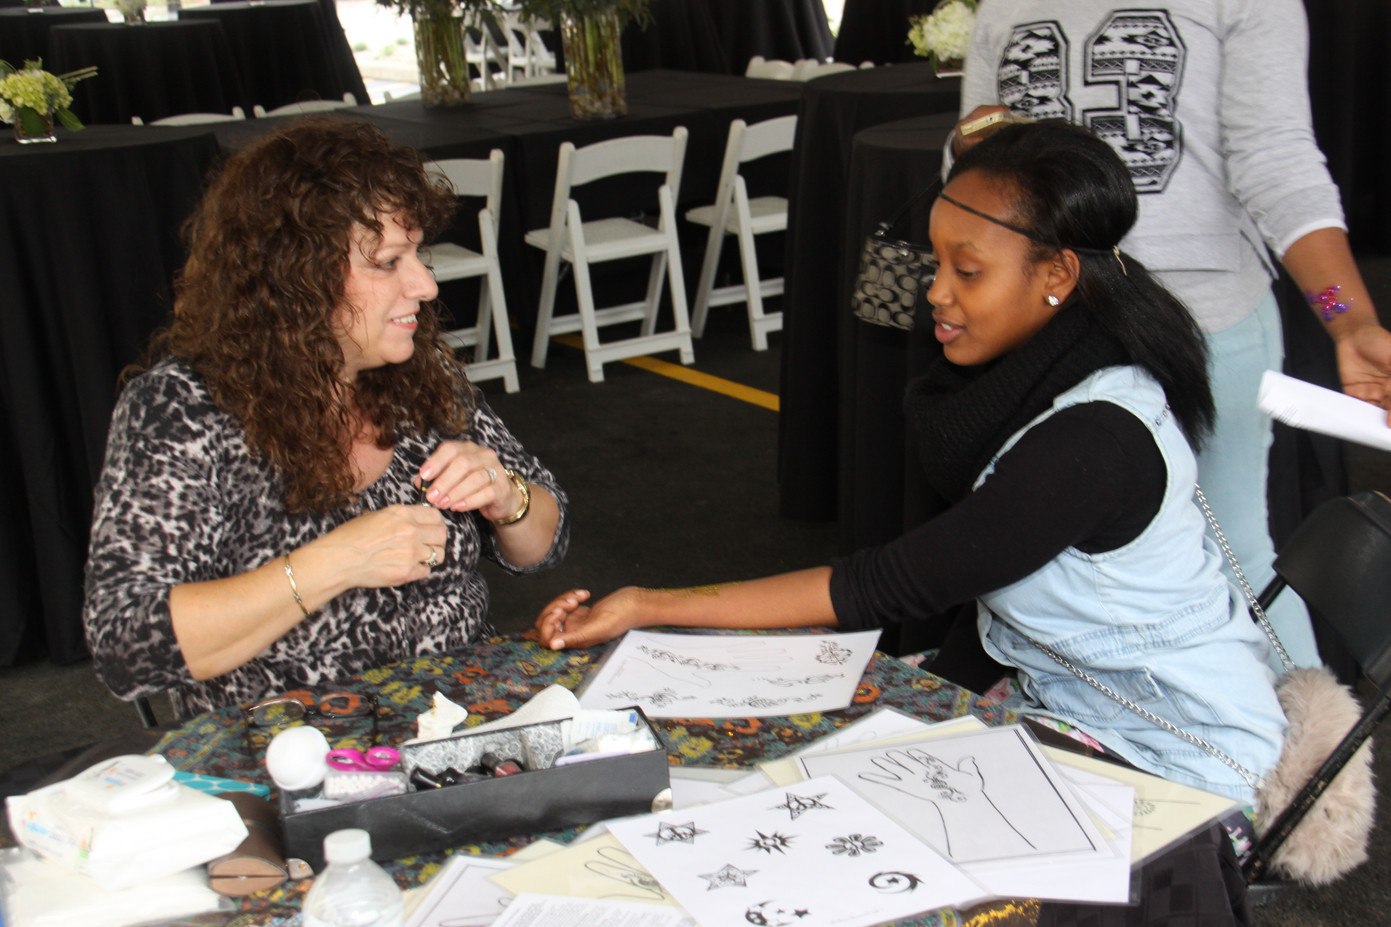 Henna-Tattoo-Artist-And-Guest.JPG